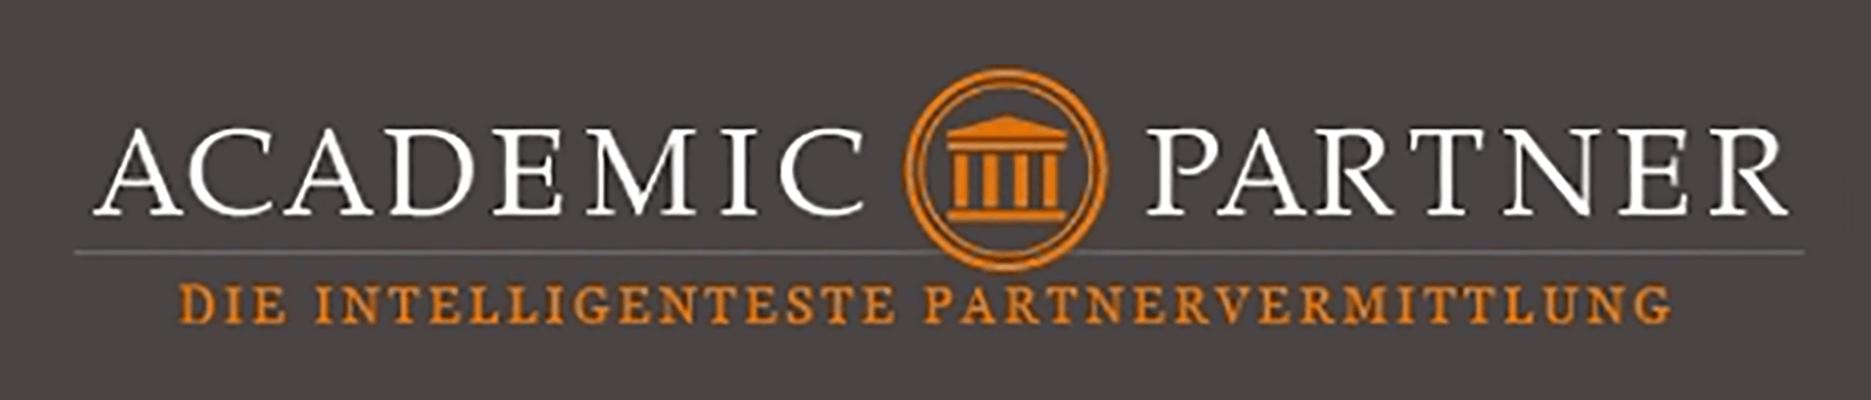 Partnersuche academic